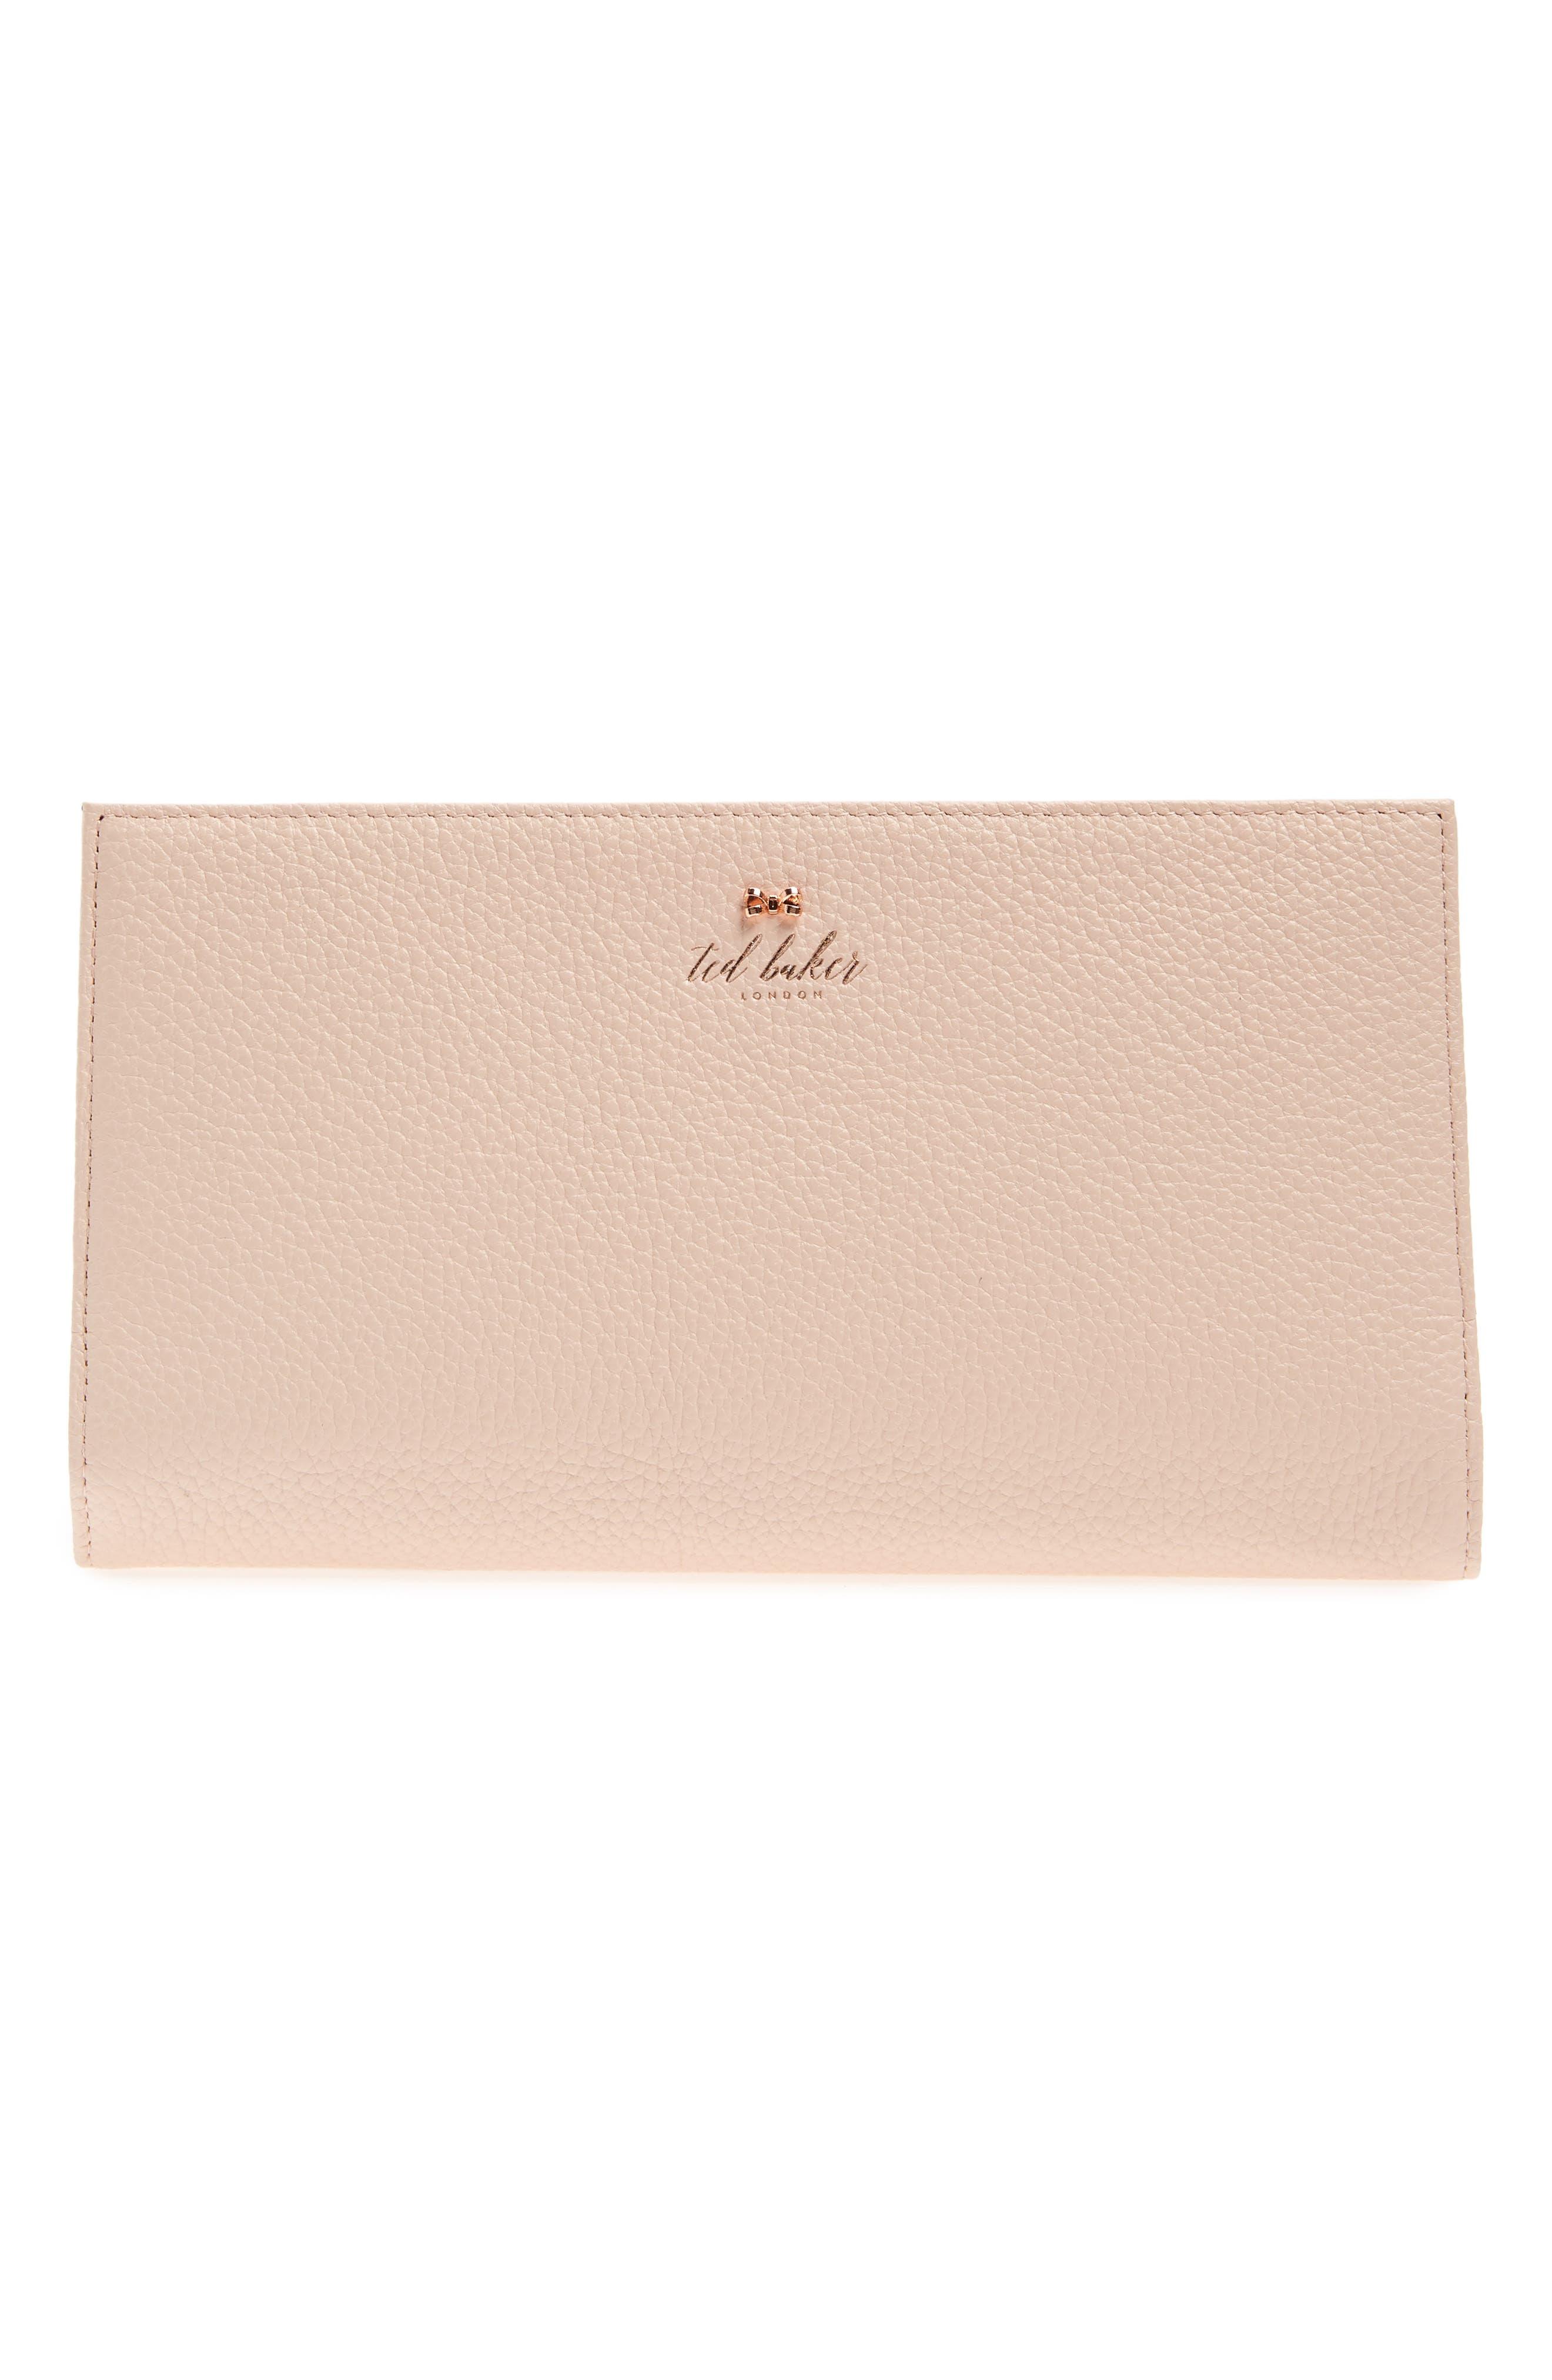 Kayy Metallic Leather Travel Wallet,                             Main thumbnail 2, color,